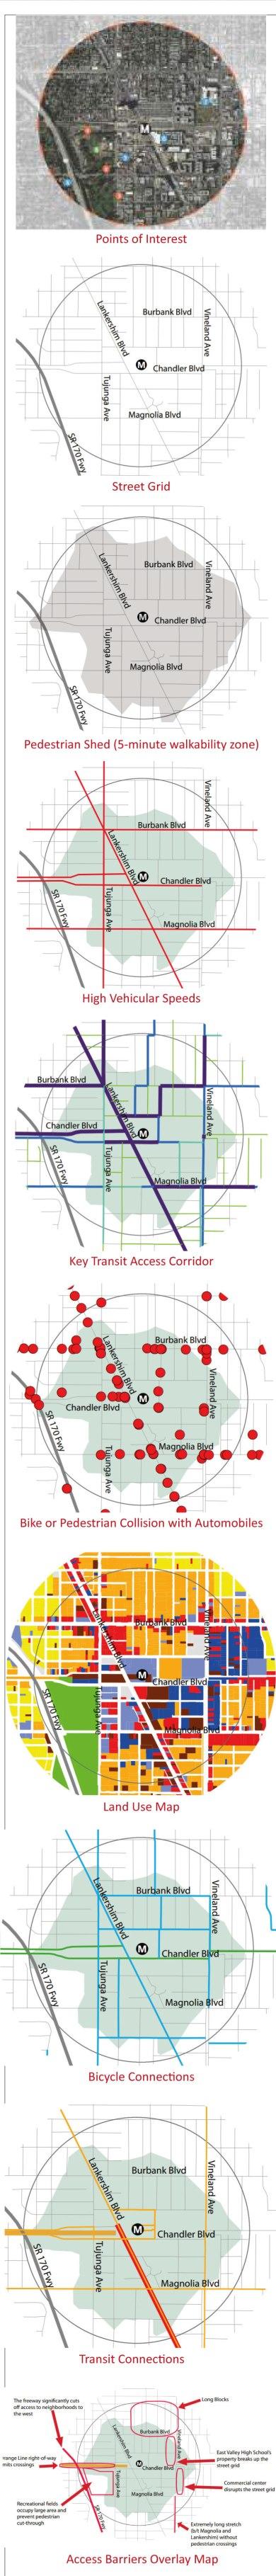 la_metro_street_study_map